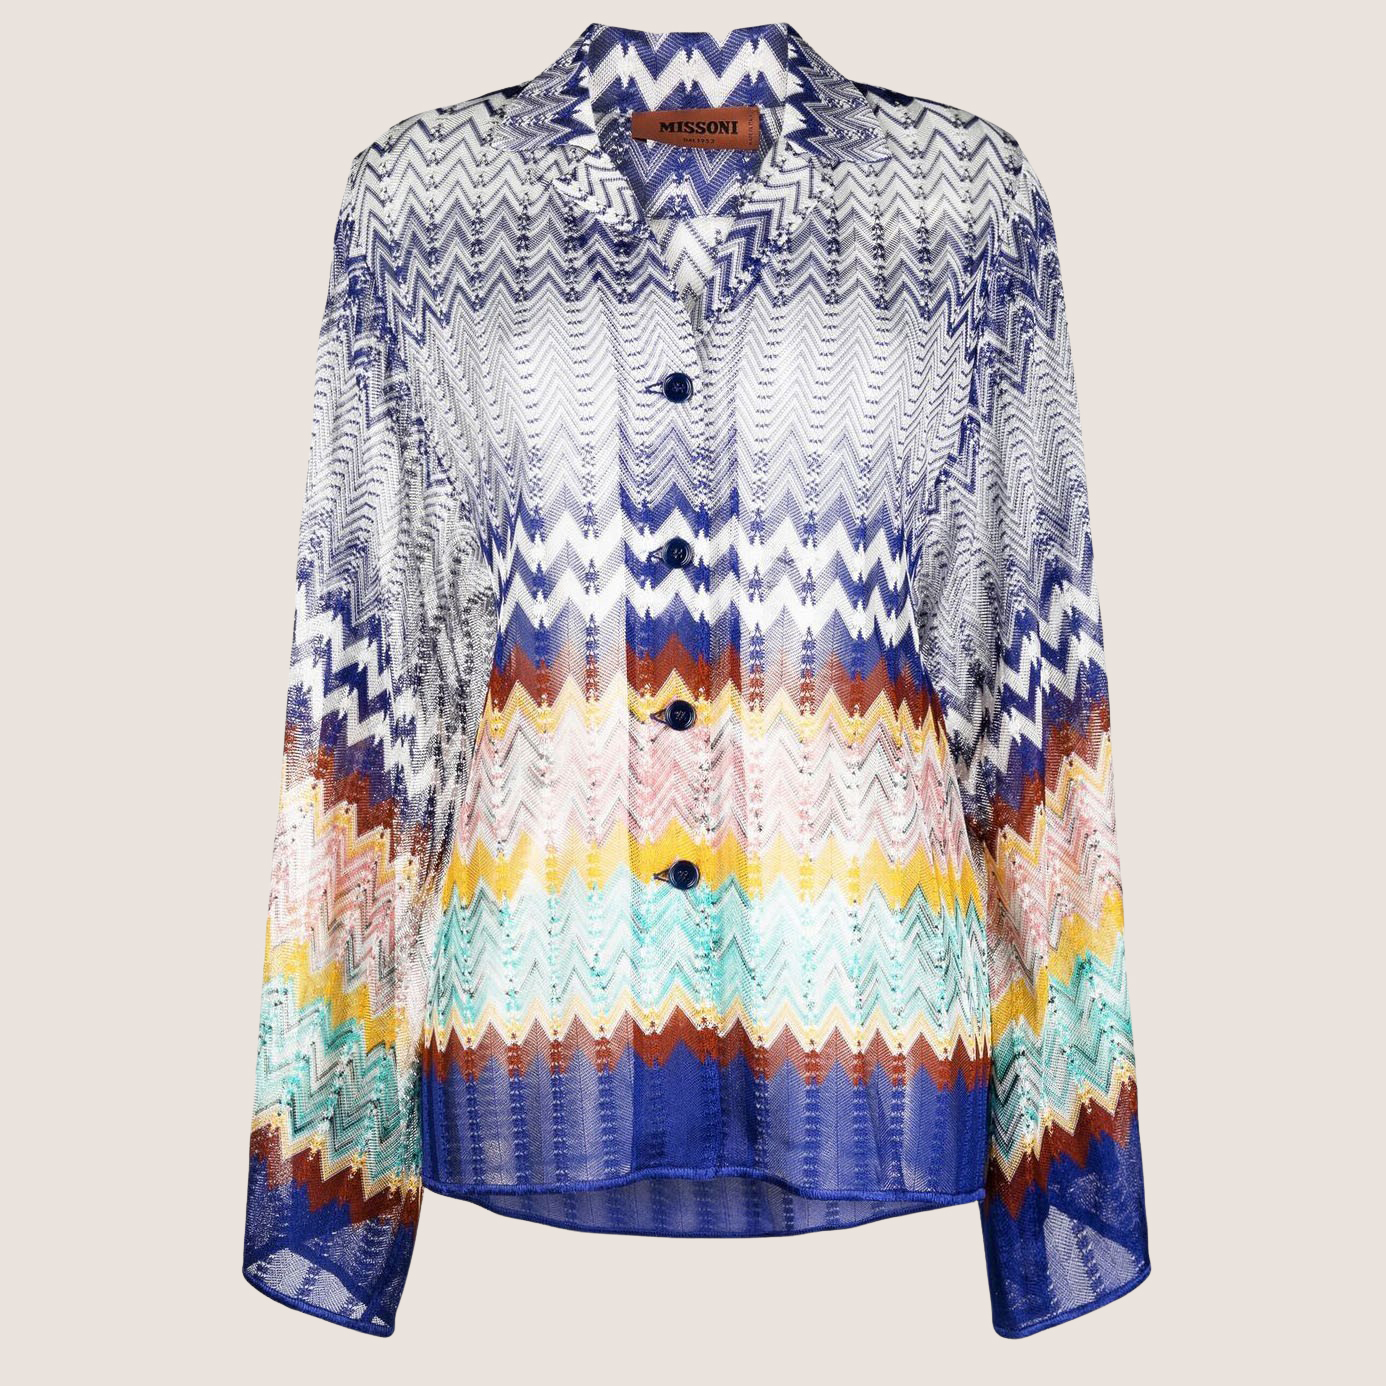 Missoni - Long Sleeve Shirt